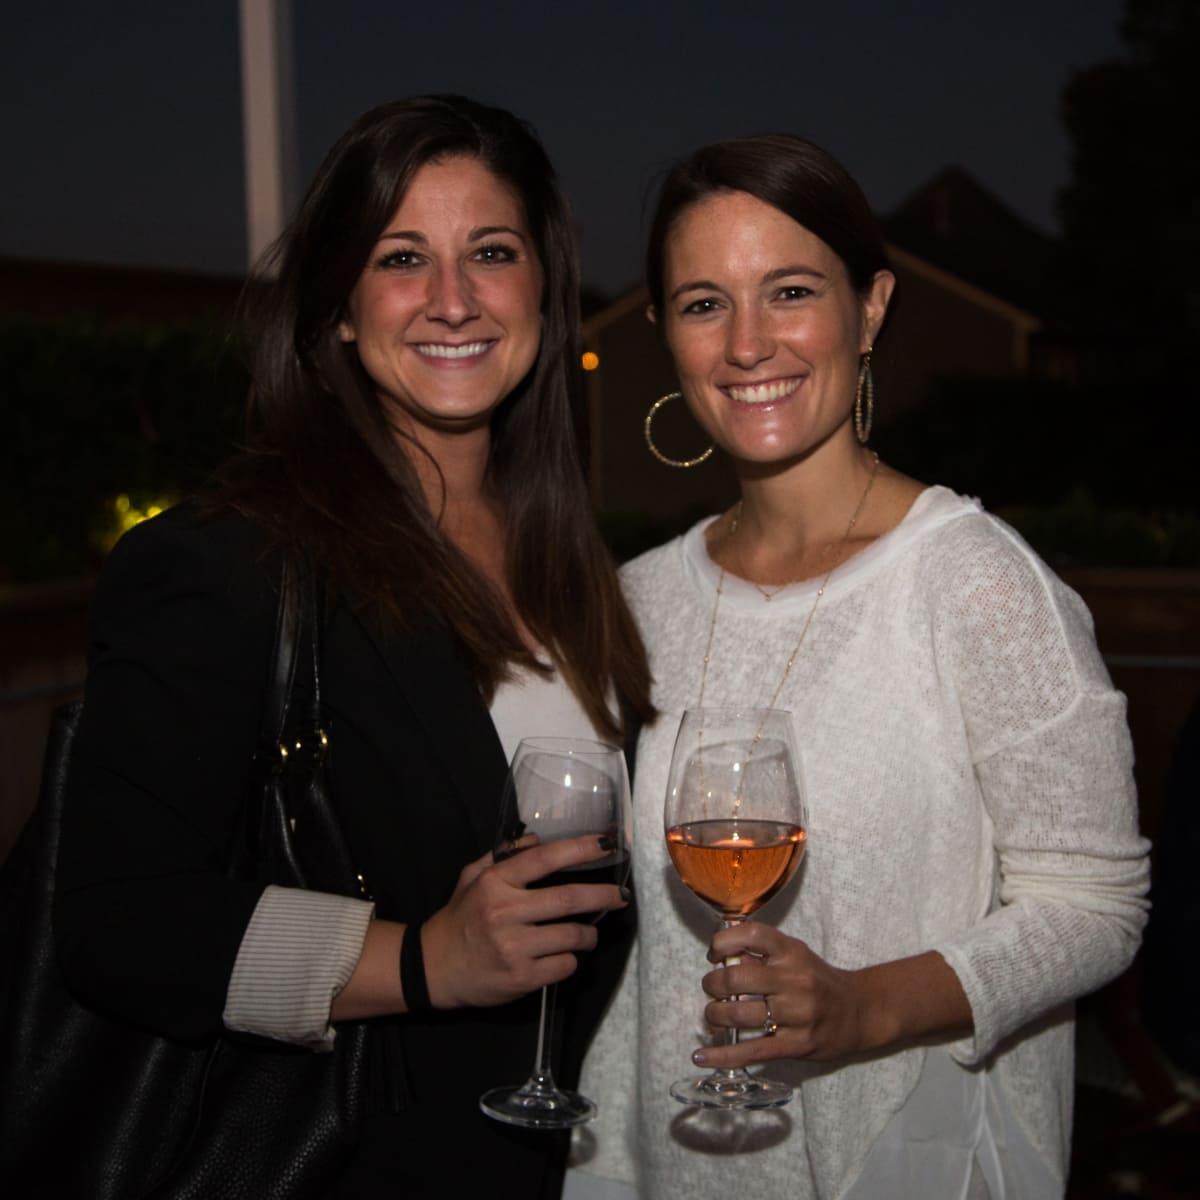 B&B Butchers terrace party Lauren Smith, Callie Anne Holland